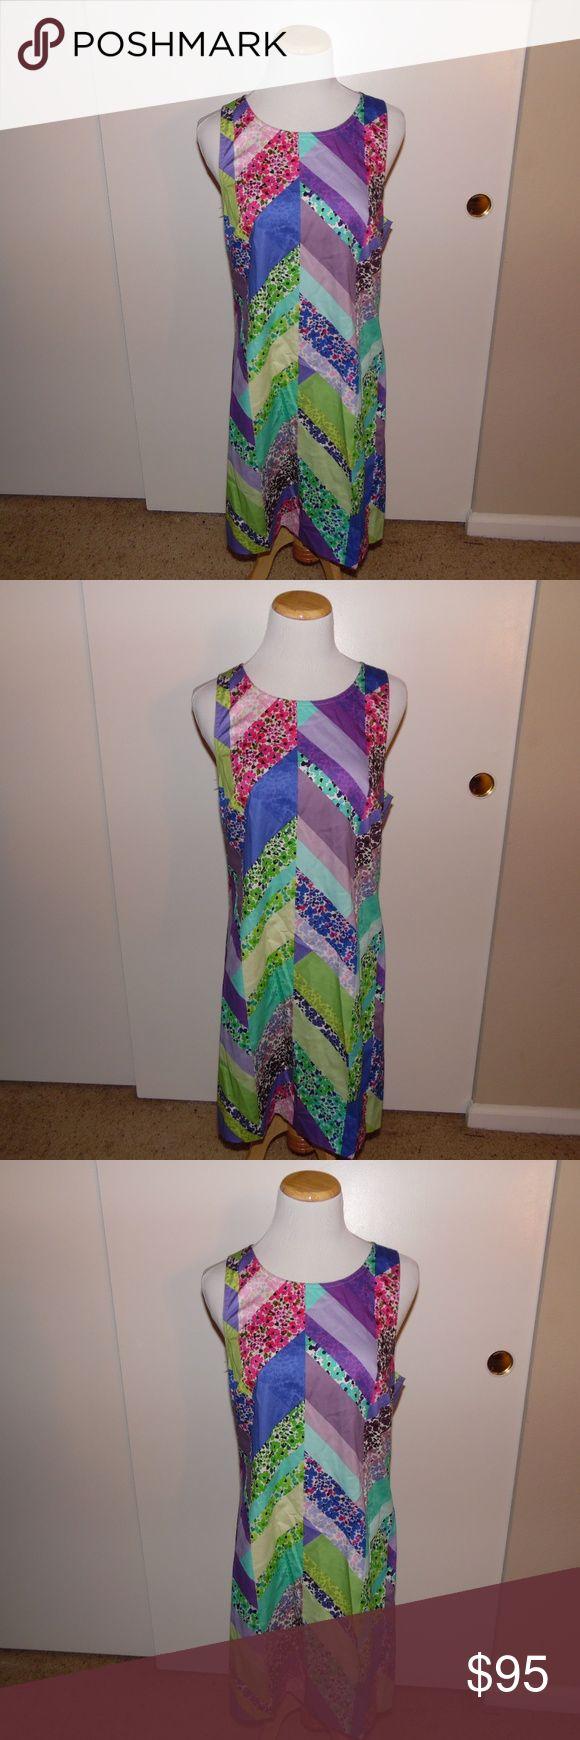 Trina Turk Comse Floral Chevron Dress Brand new with tags size 8 Trina Turk Comse Floral Chevron Multi Color Dress. Trina Turk Dresses